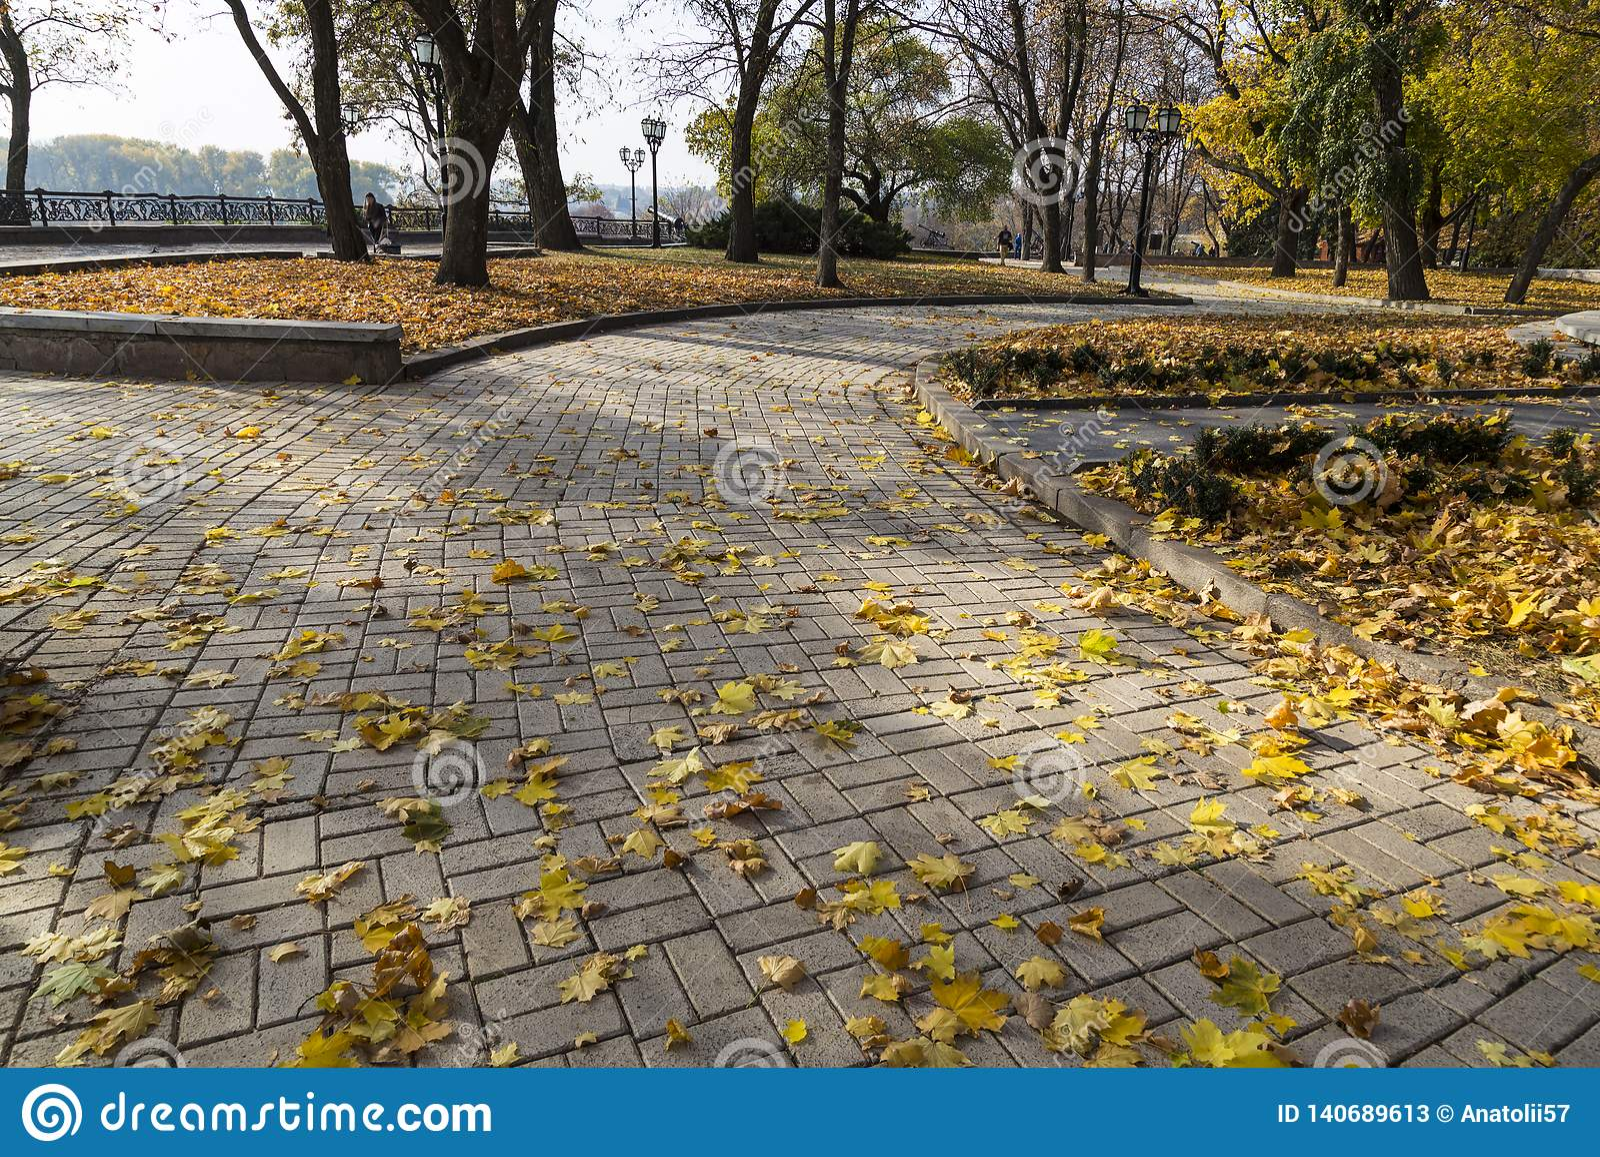 Golden autumn in the city park. City Chernihiv. Ukraine